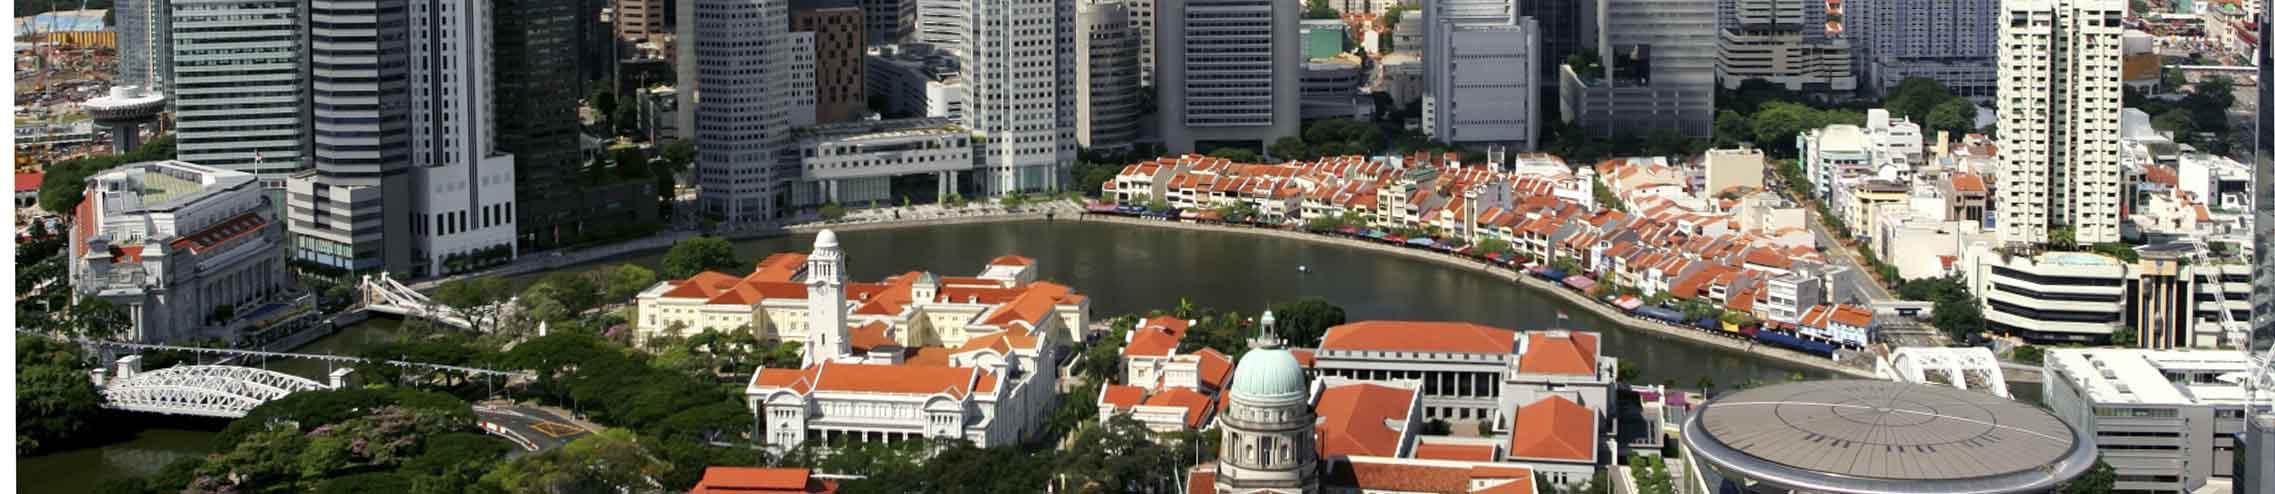 SingaporeHeader2